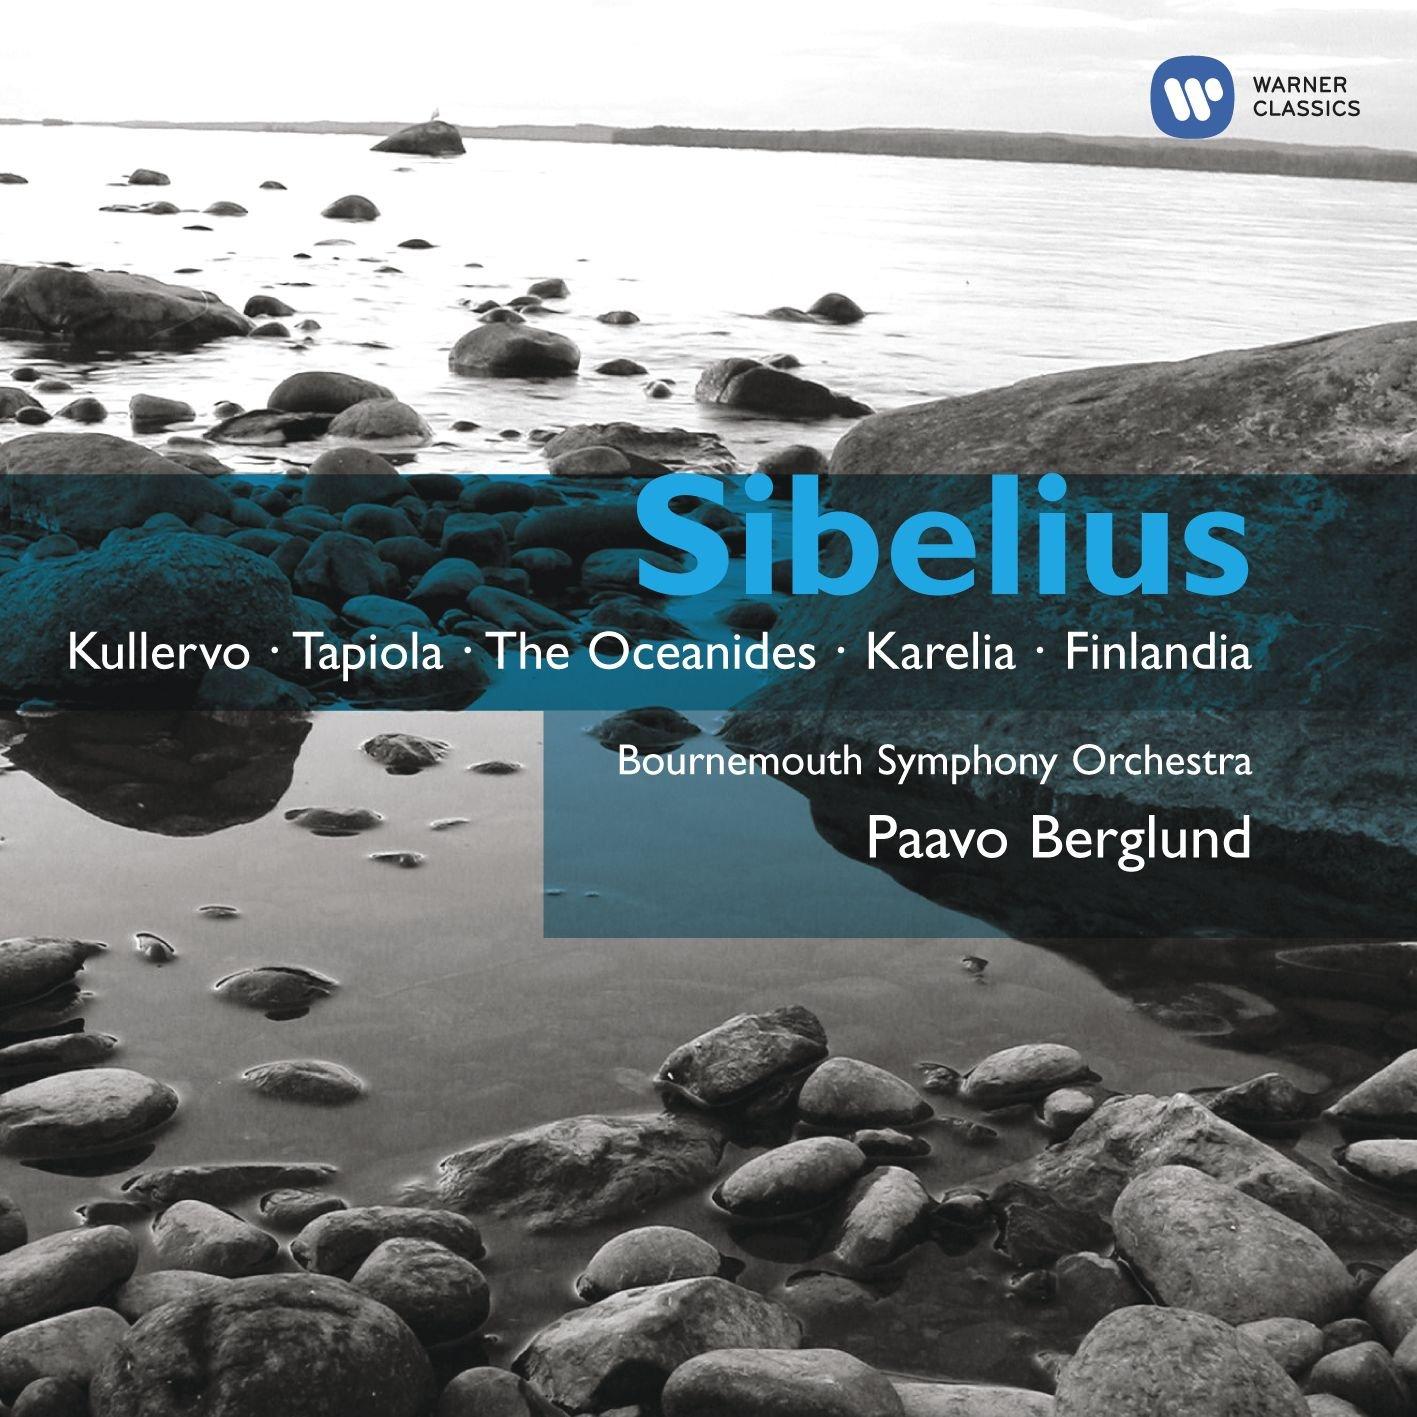 Sibelius: Kullervo Paavo Berglund J. Sibelius Warner Classics Classical